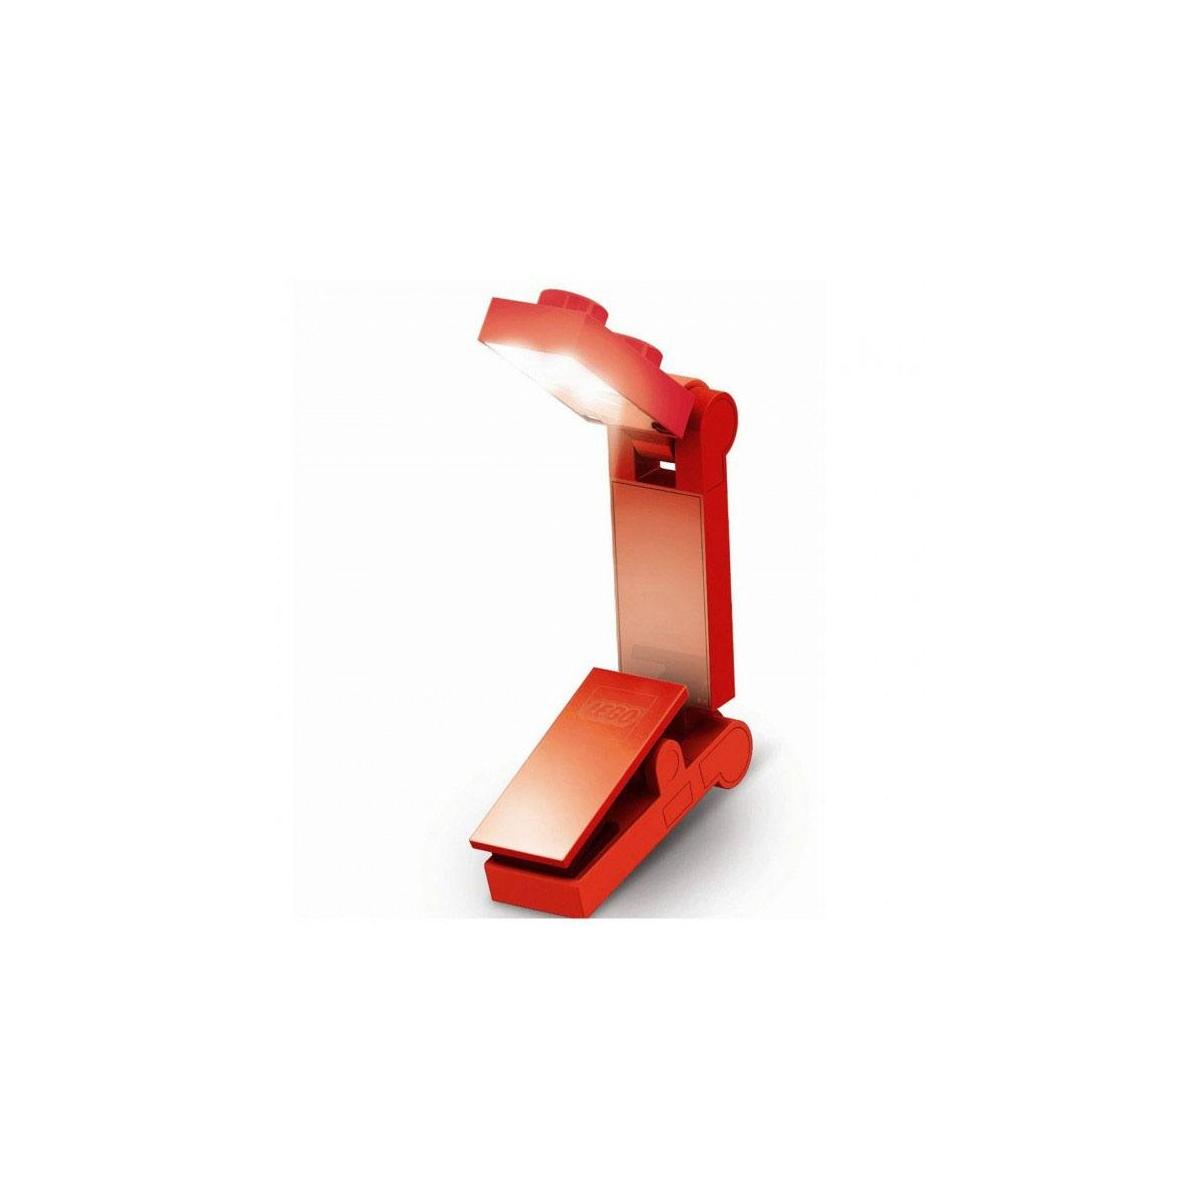 lego - lego lampe de lecture led rouge - figurine-discount